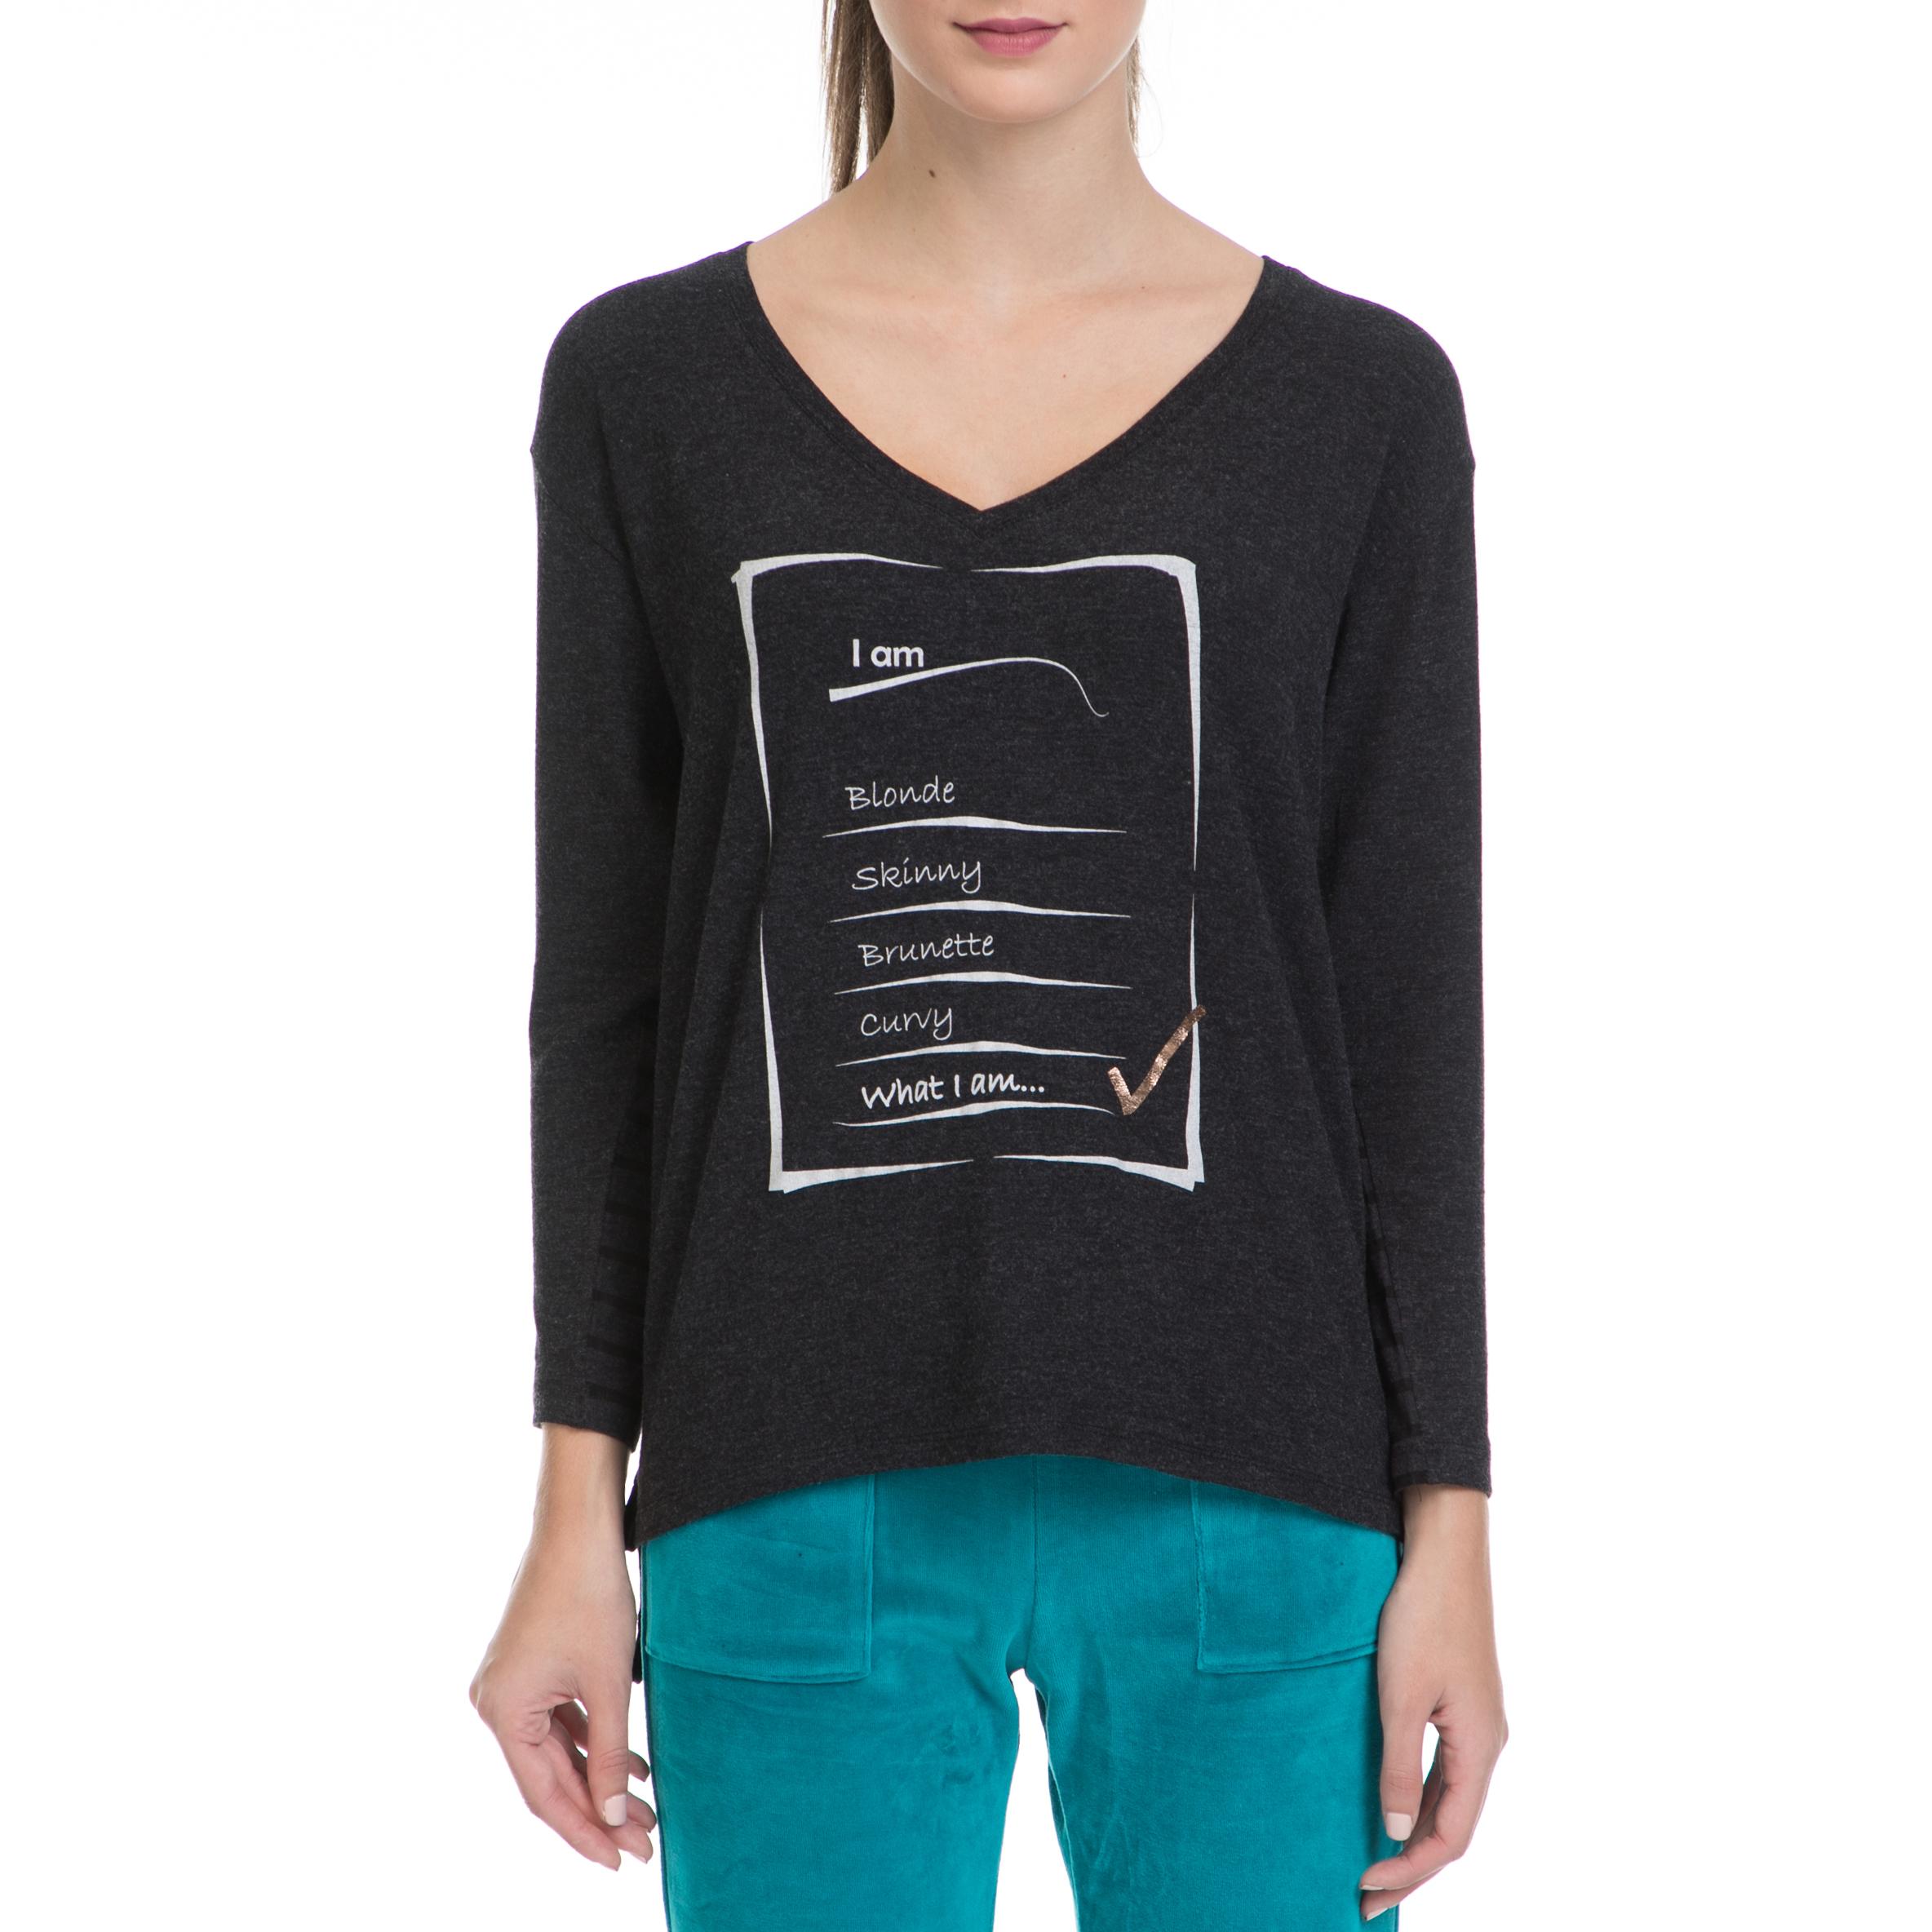 MYMOO – Γυναικεία μπλούζα I AM ΜΥΜΟΟ γκρι